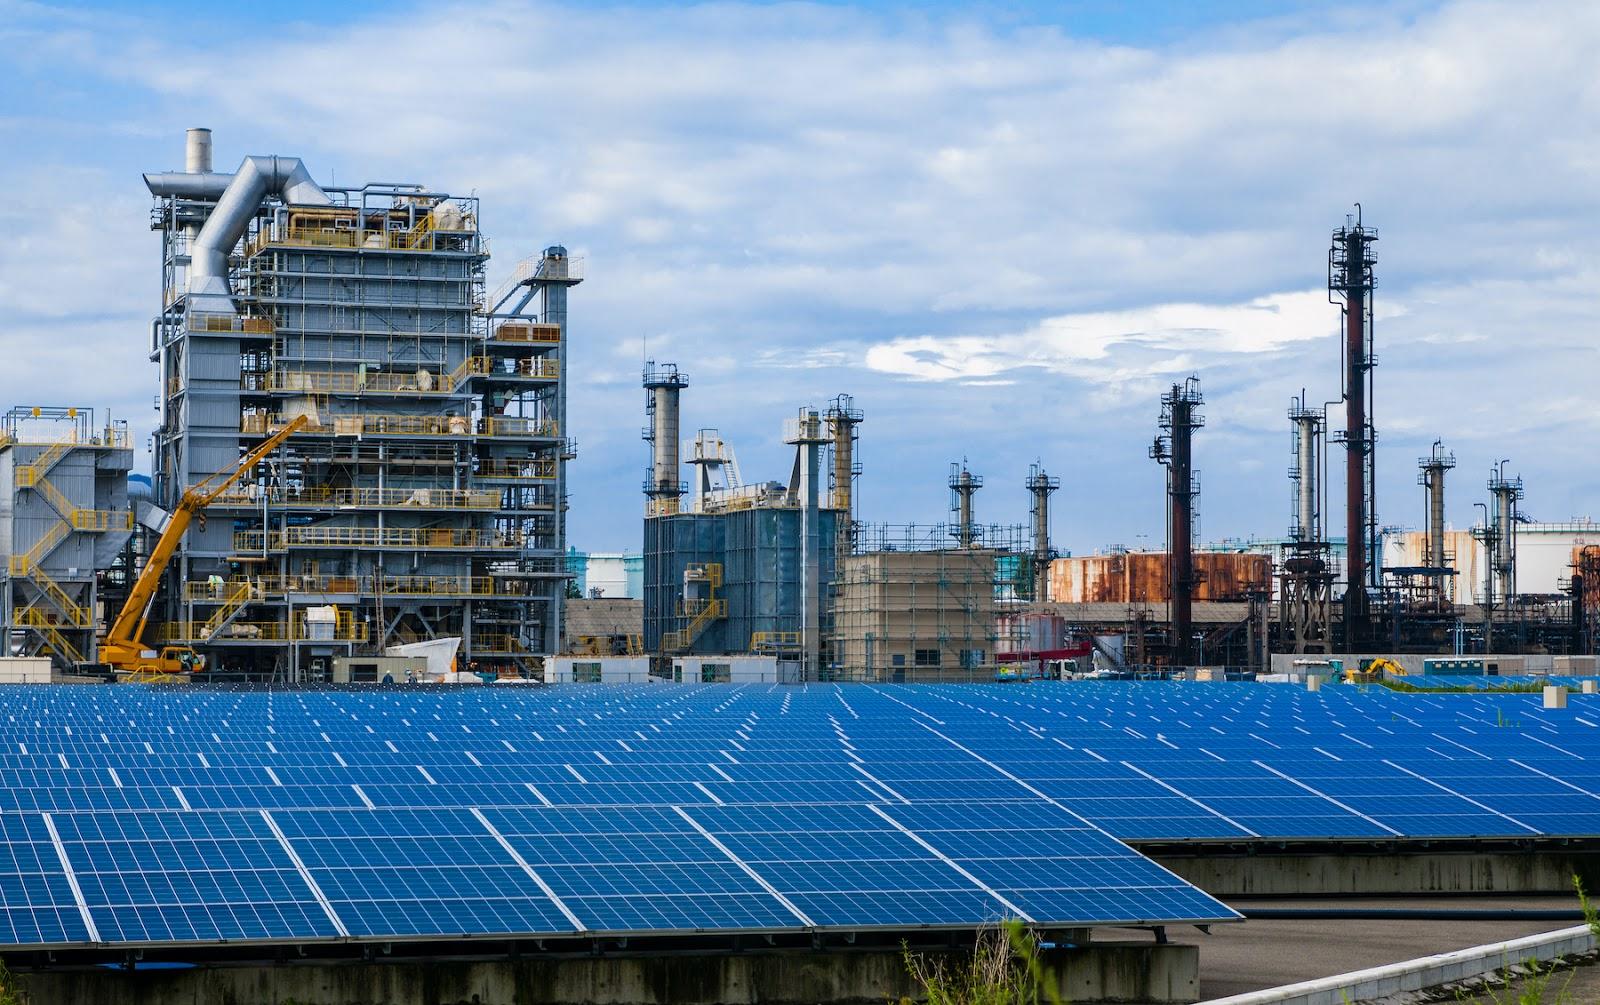 Solar Powered Industrial Buildings